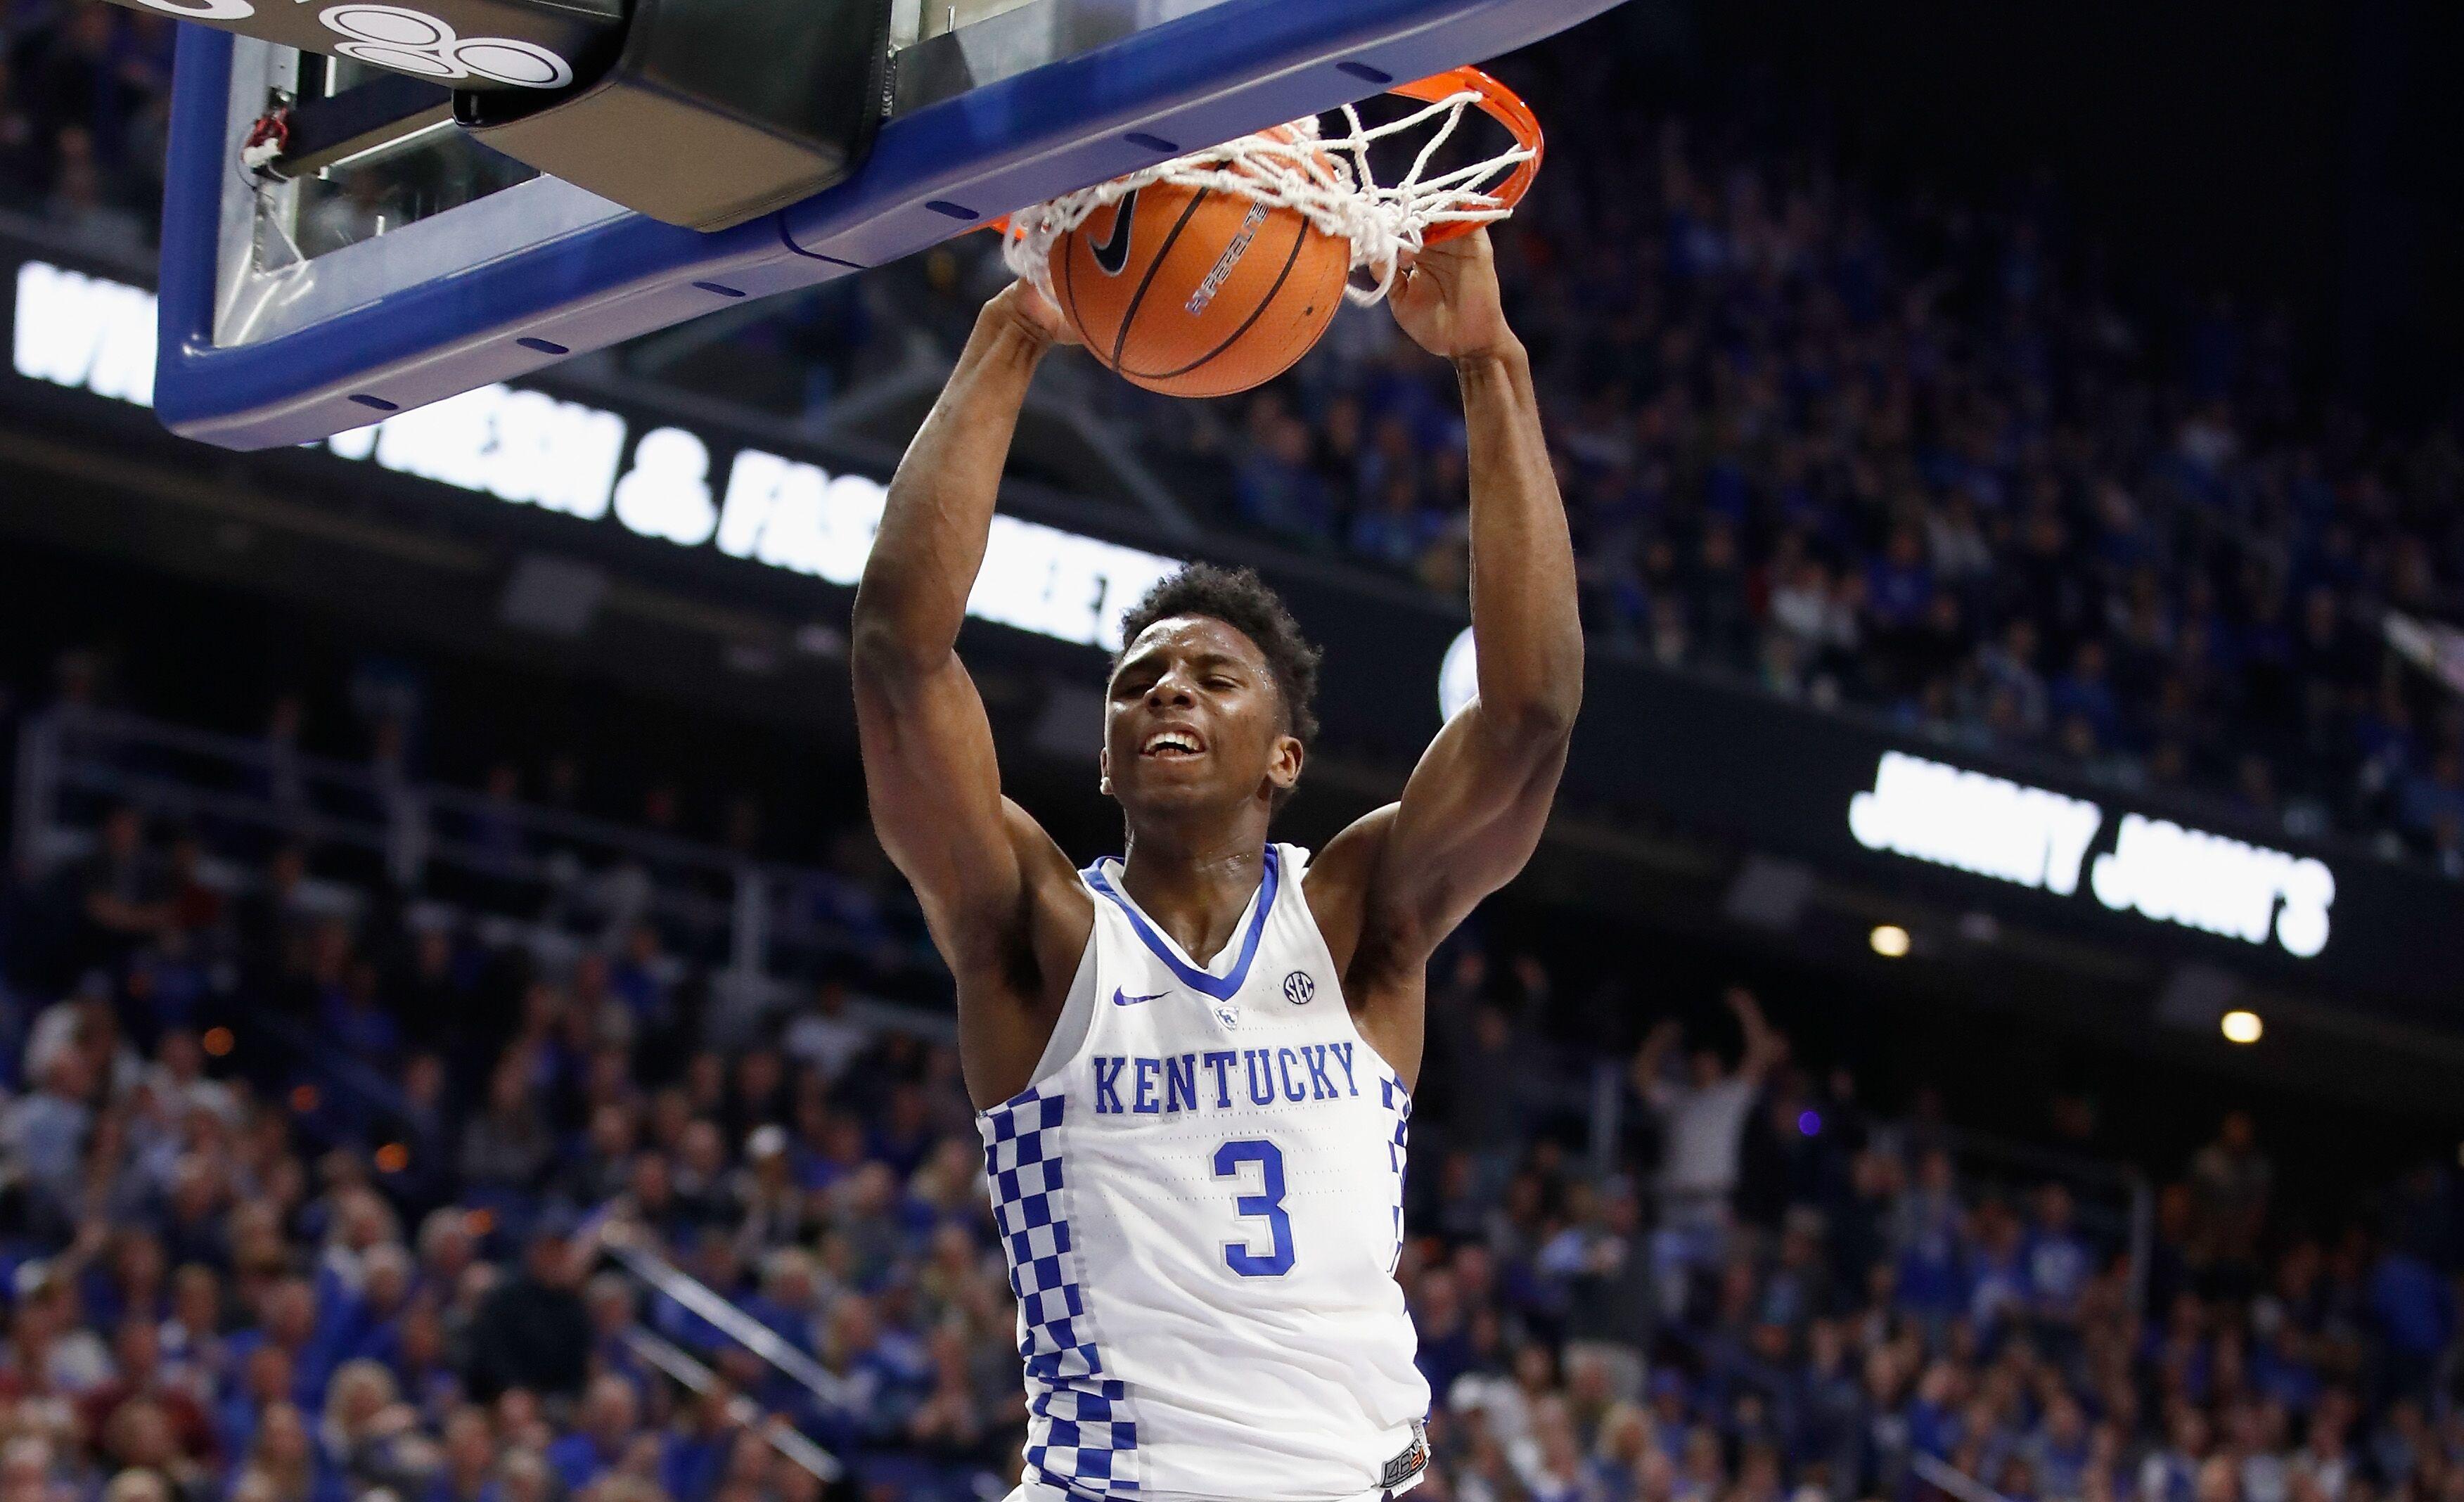 Kentucky Basketball Named Preseason Favorite For Sec Crown: Hamidou Diallo Is Elevating His Game For Kentucky